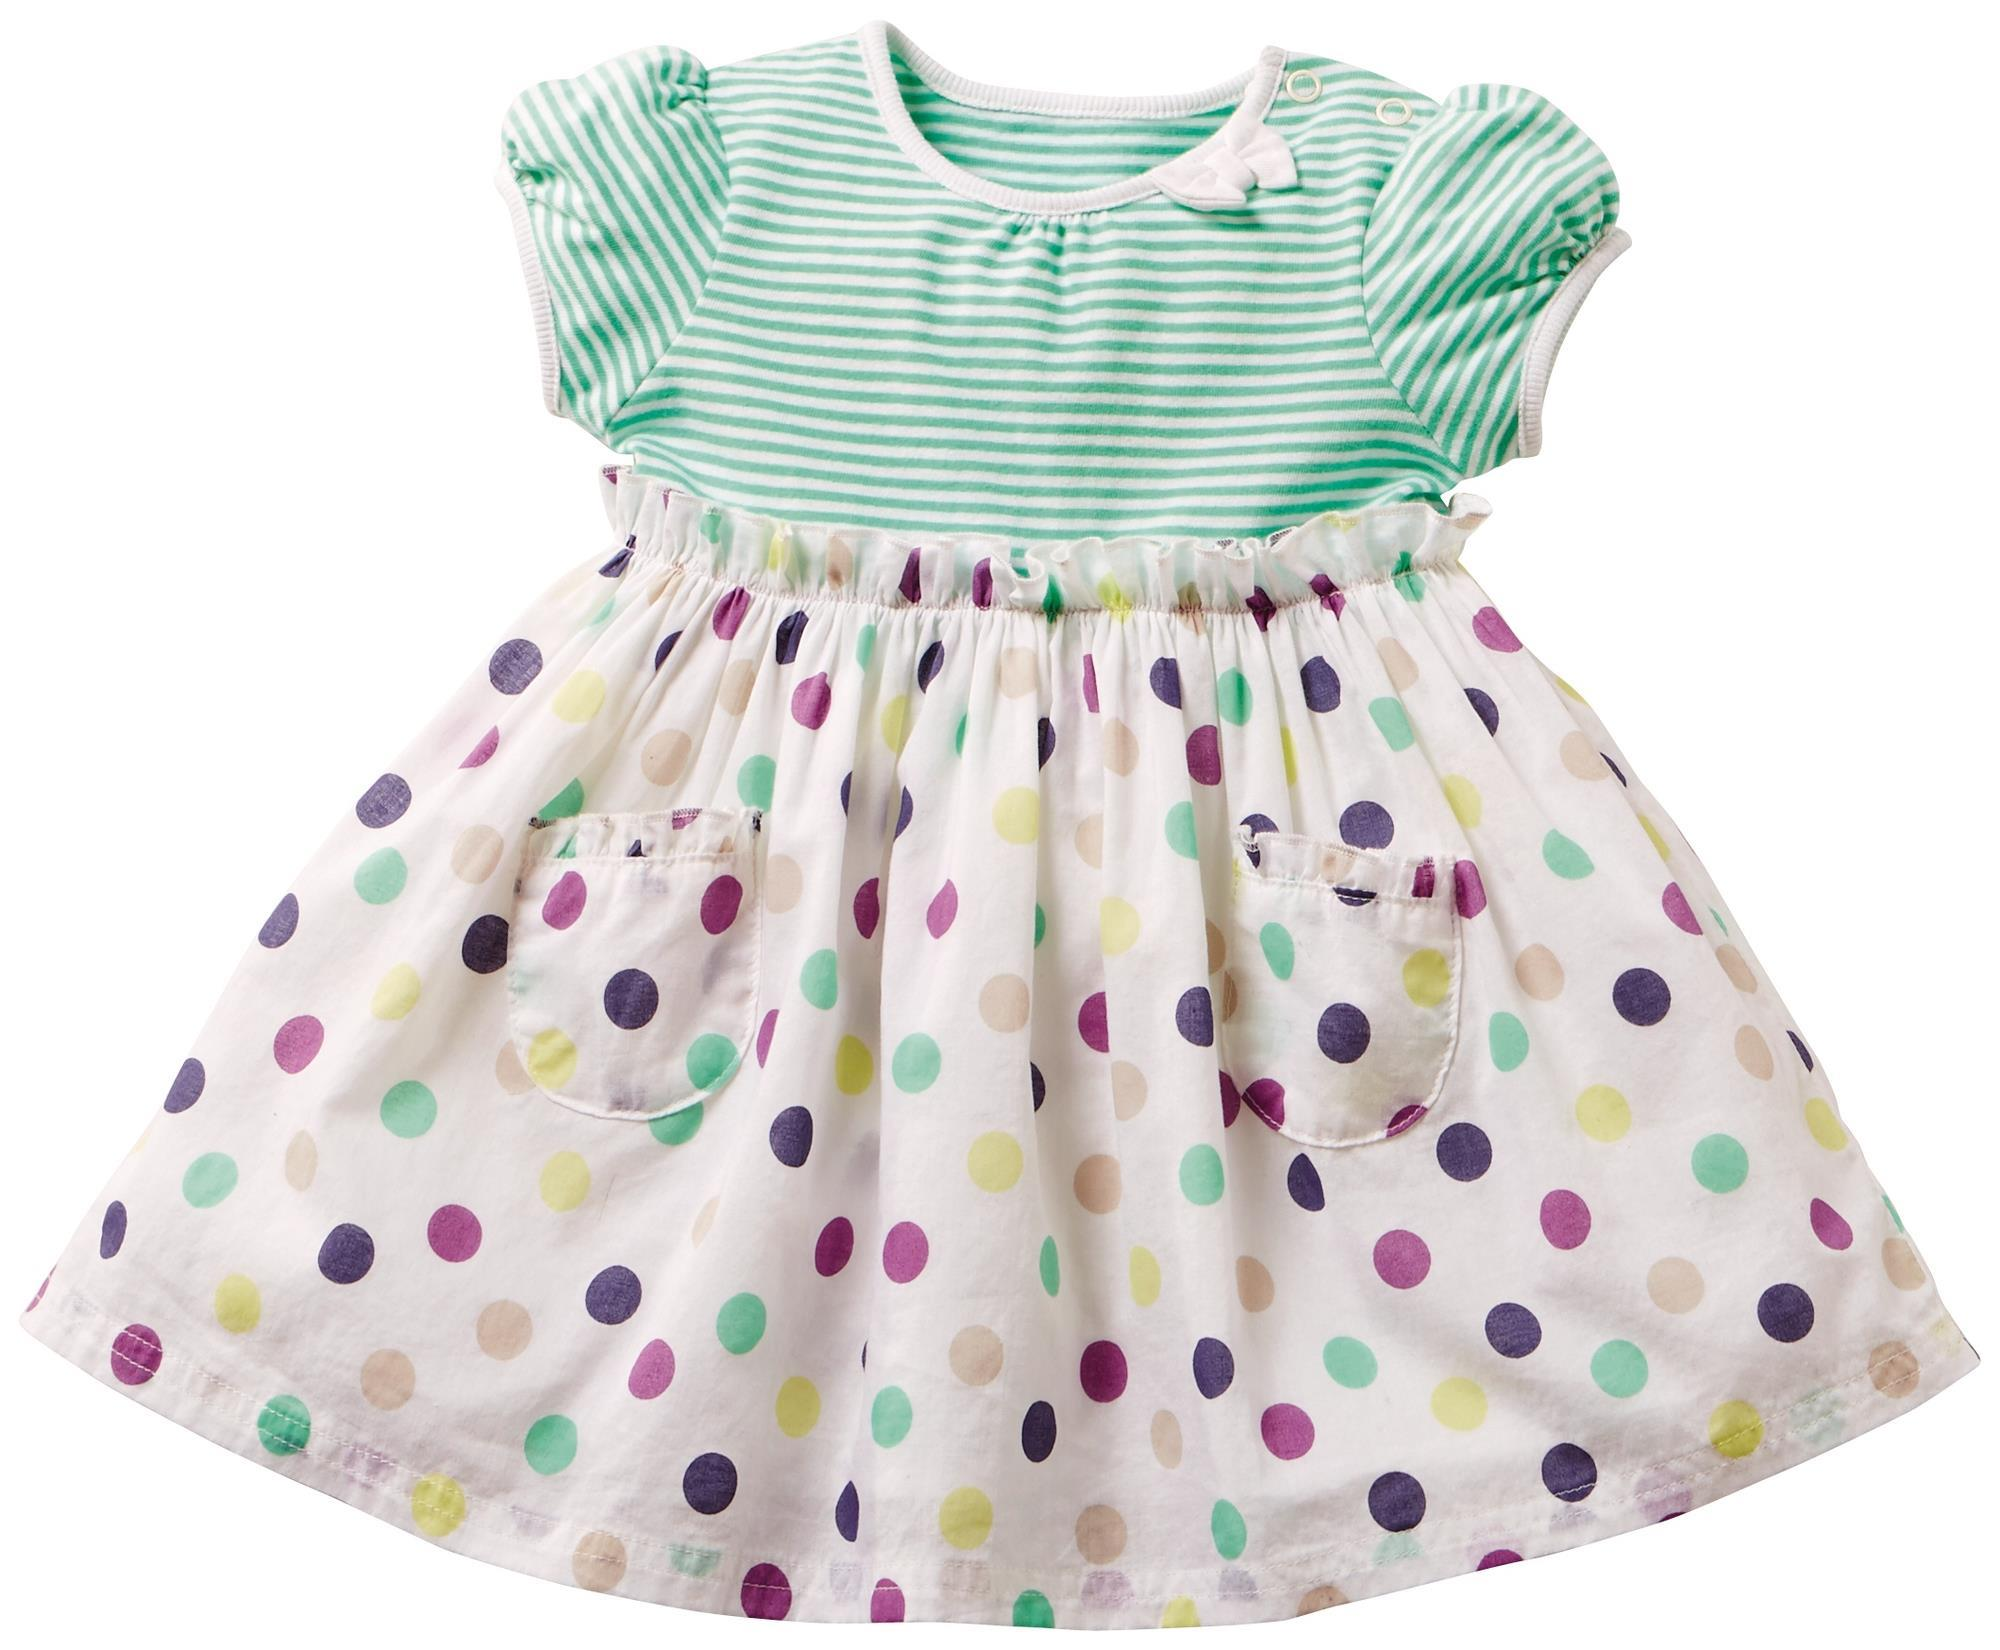 958f8115c8de In pictures: Morrisons unveils Nutmeg kids clothing range   Photo gallery    Retail Week